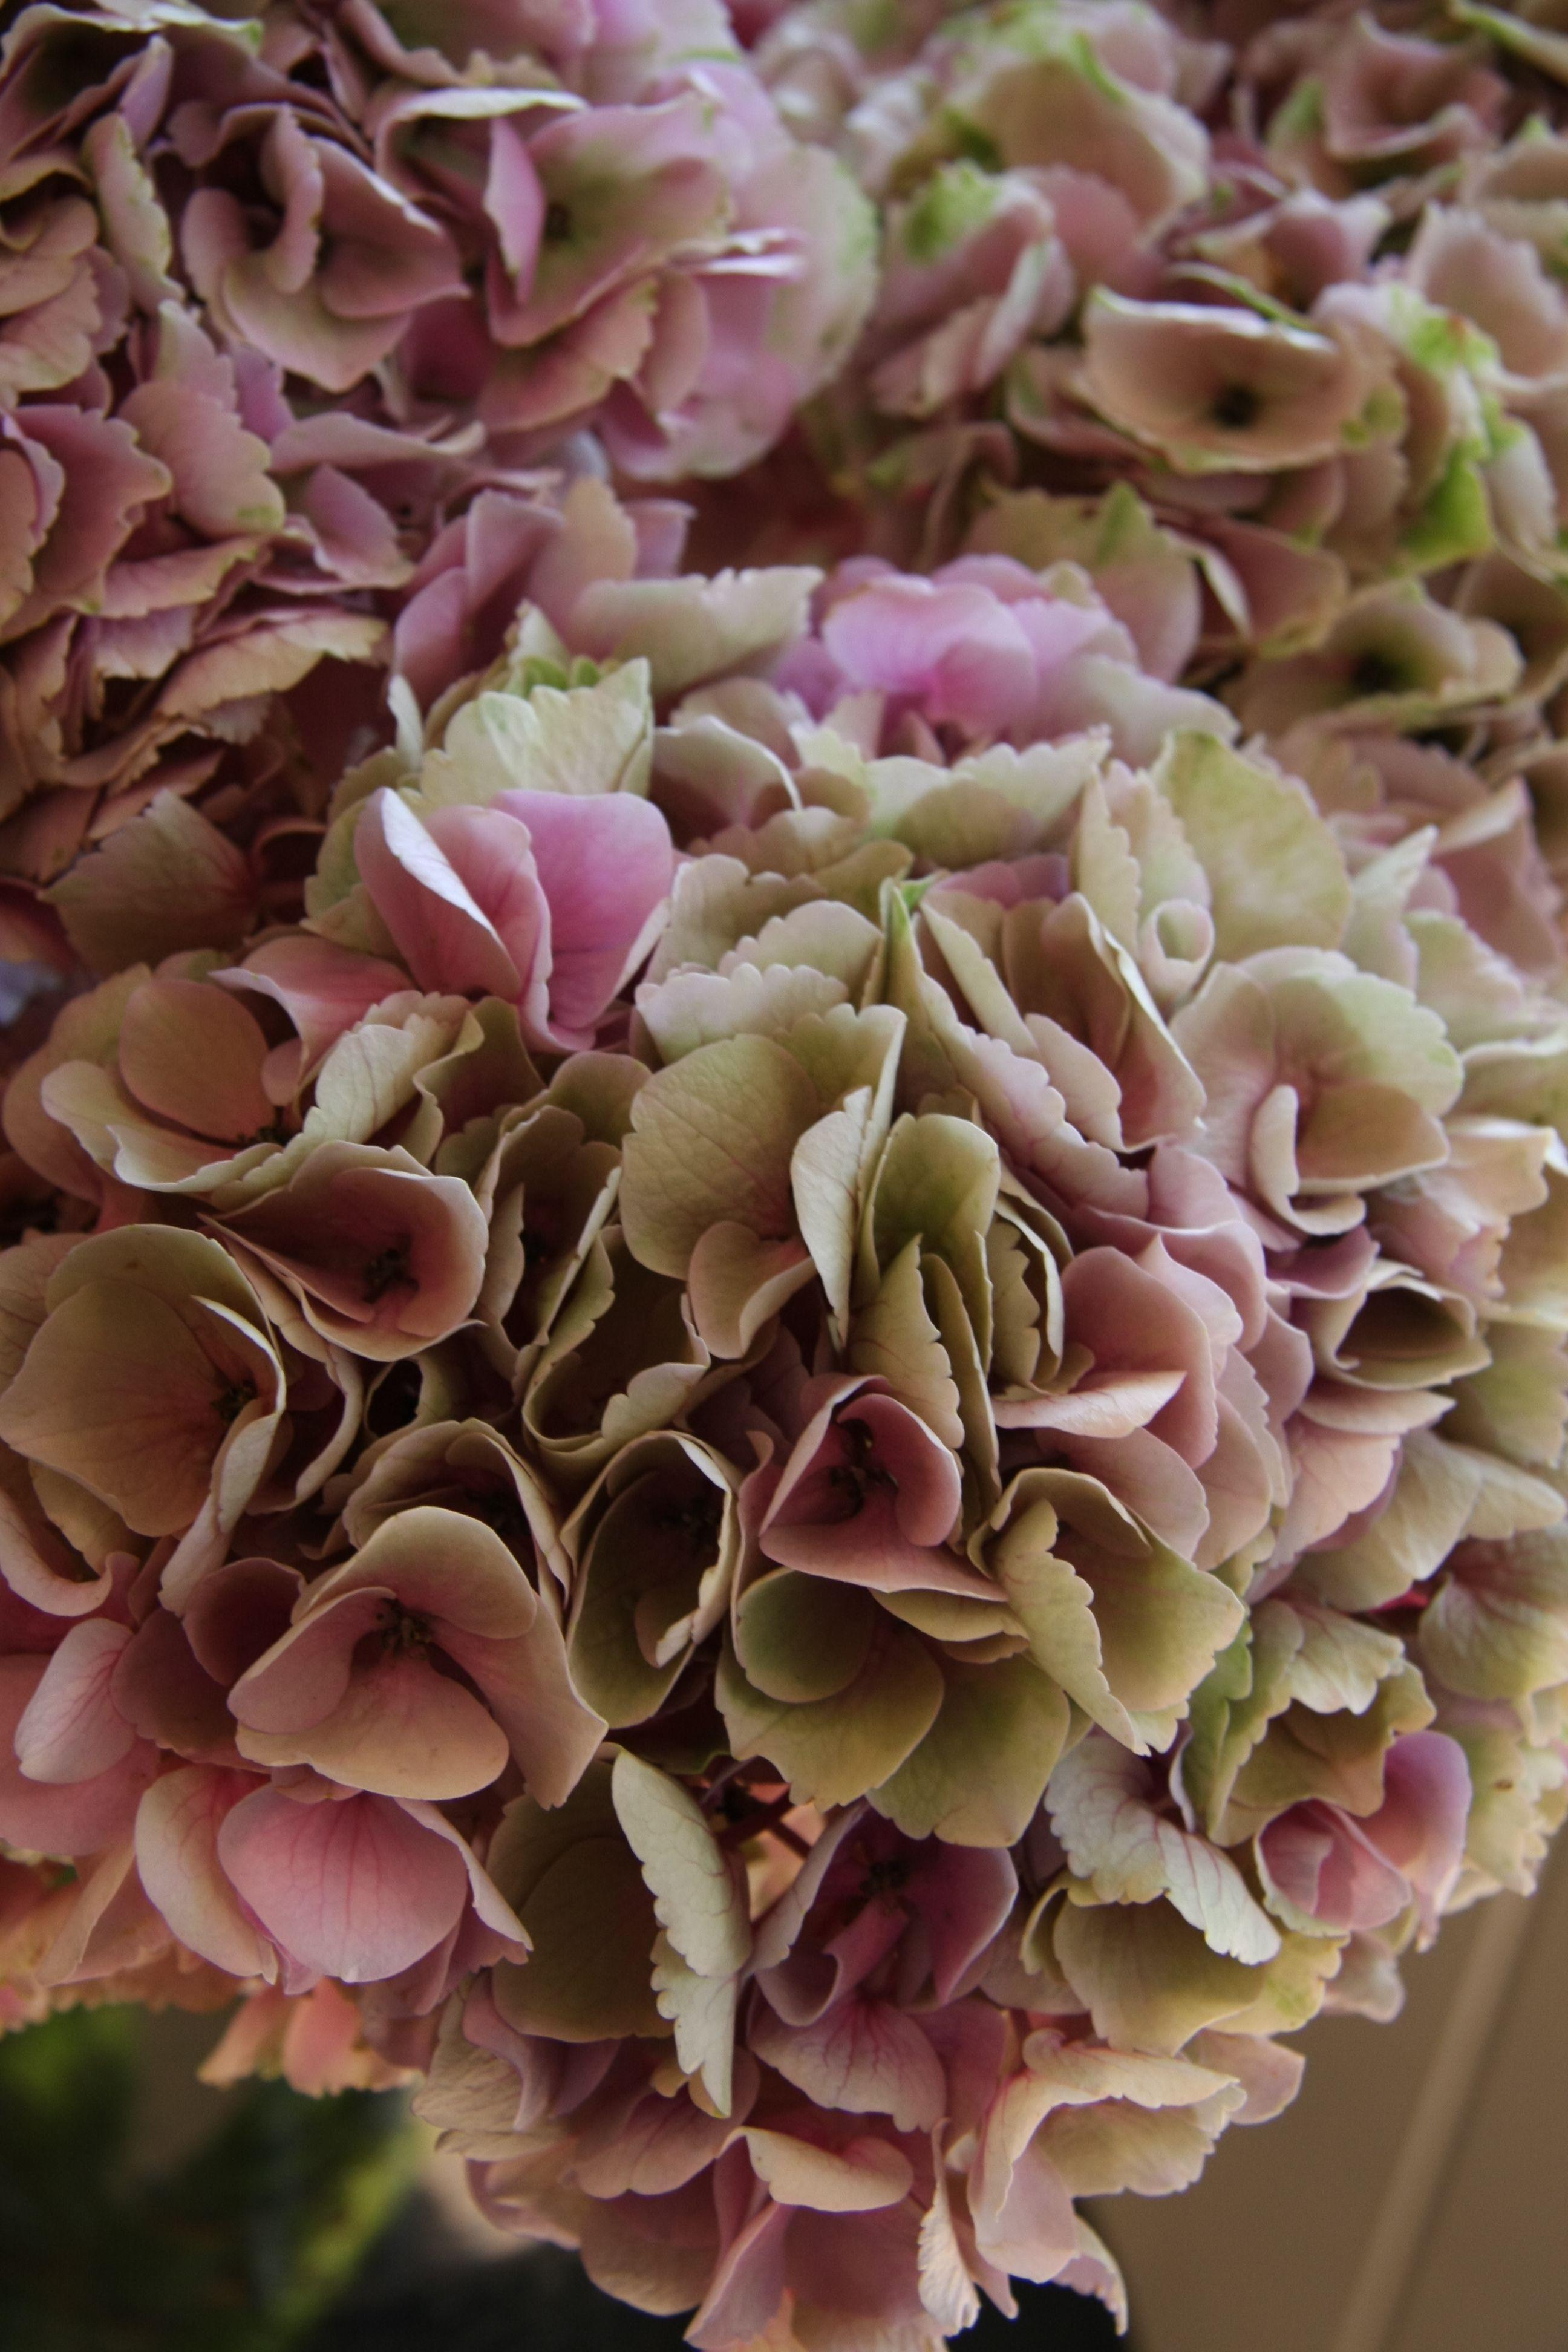 Hydrangea Peonies And Hydrangeas Hydrangea Flower Blooming Flowers